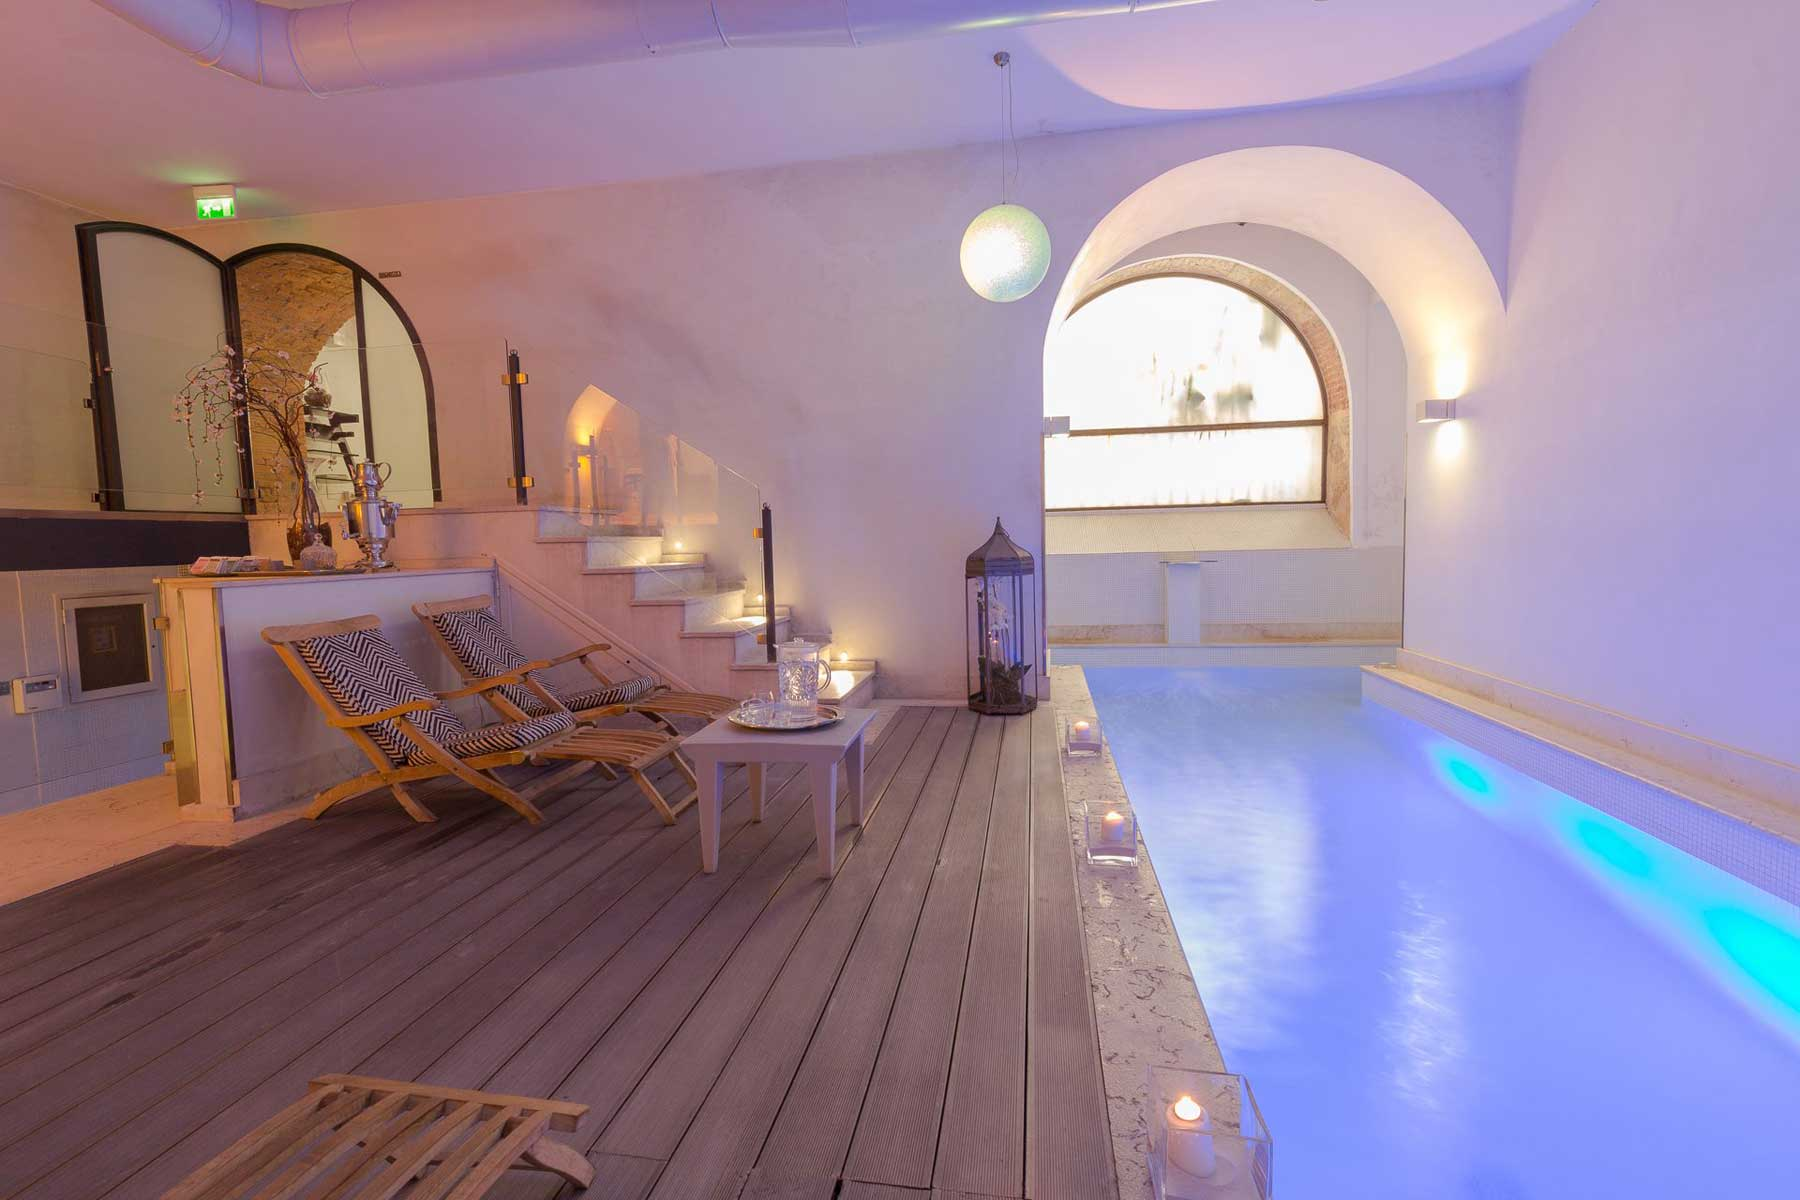 Quintocanto hotel spa palerme centre sicile for Design hotel palermo